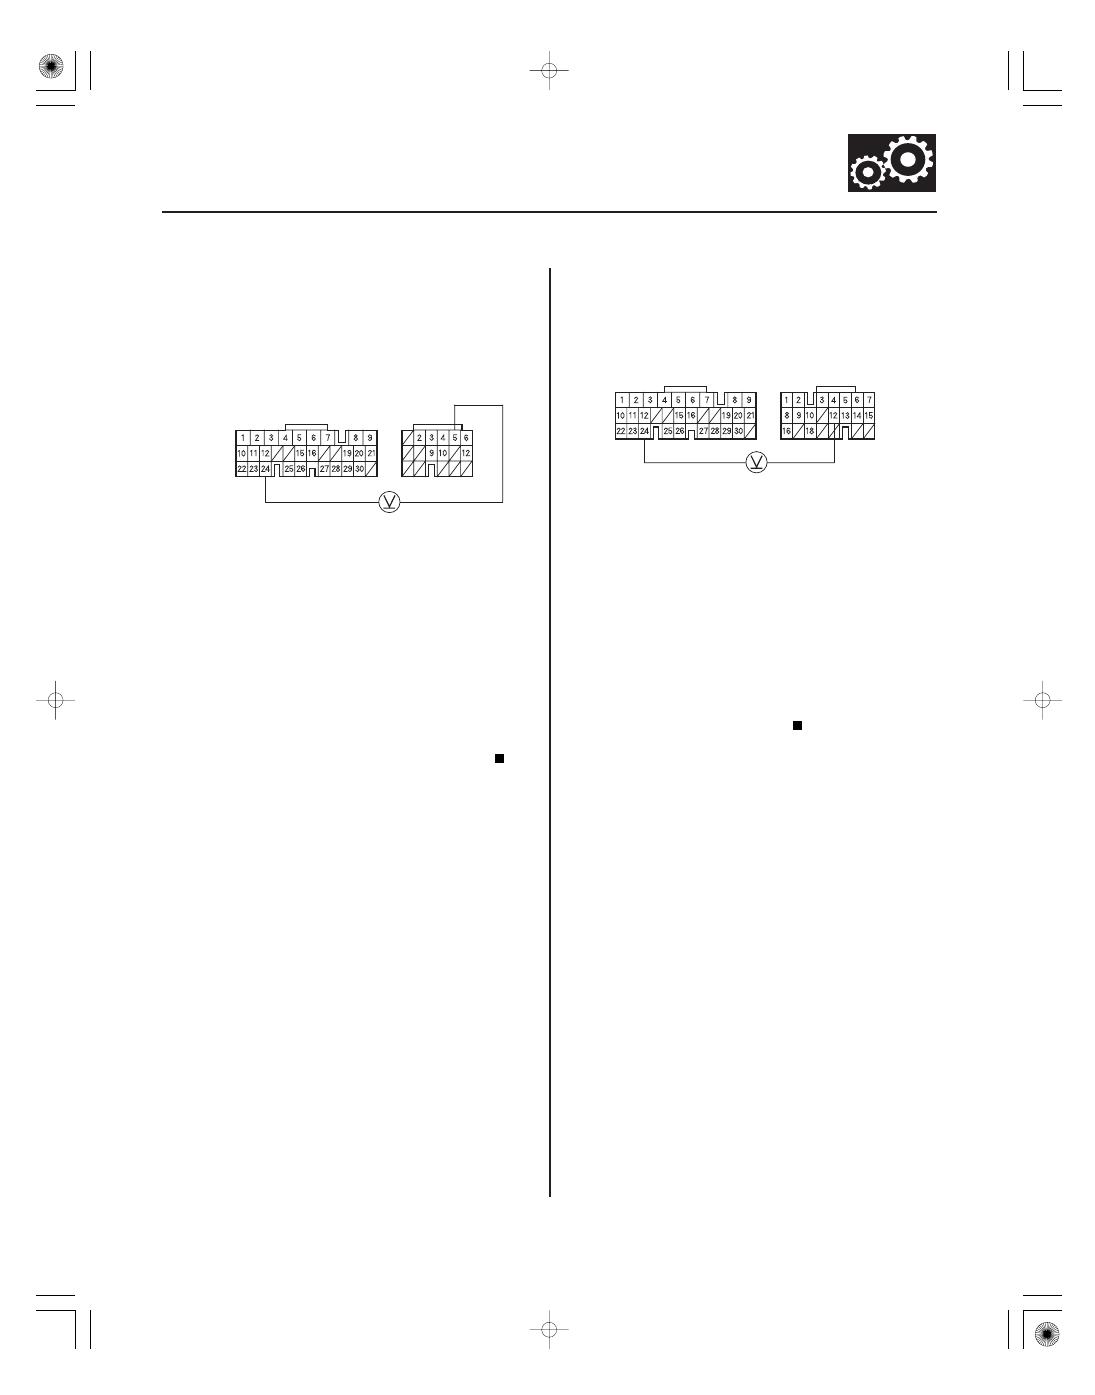 Acura Rsx Honda Integra Manual Part 251 Fuse Box